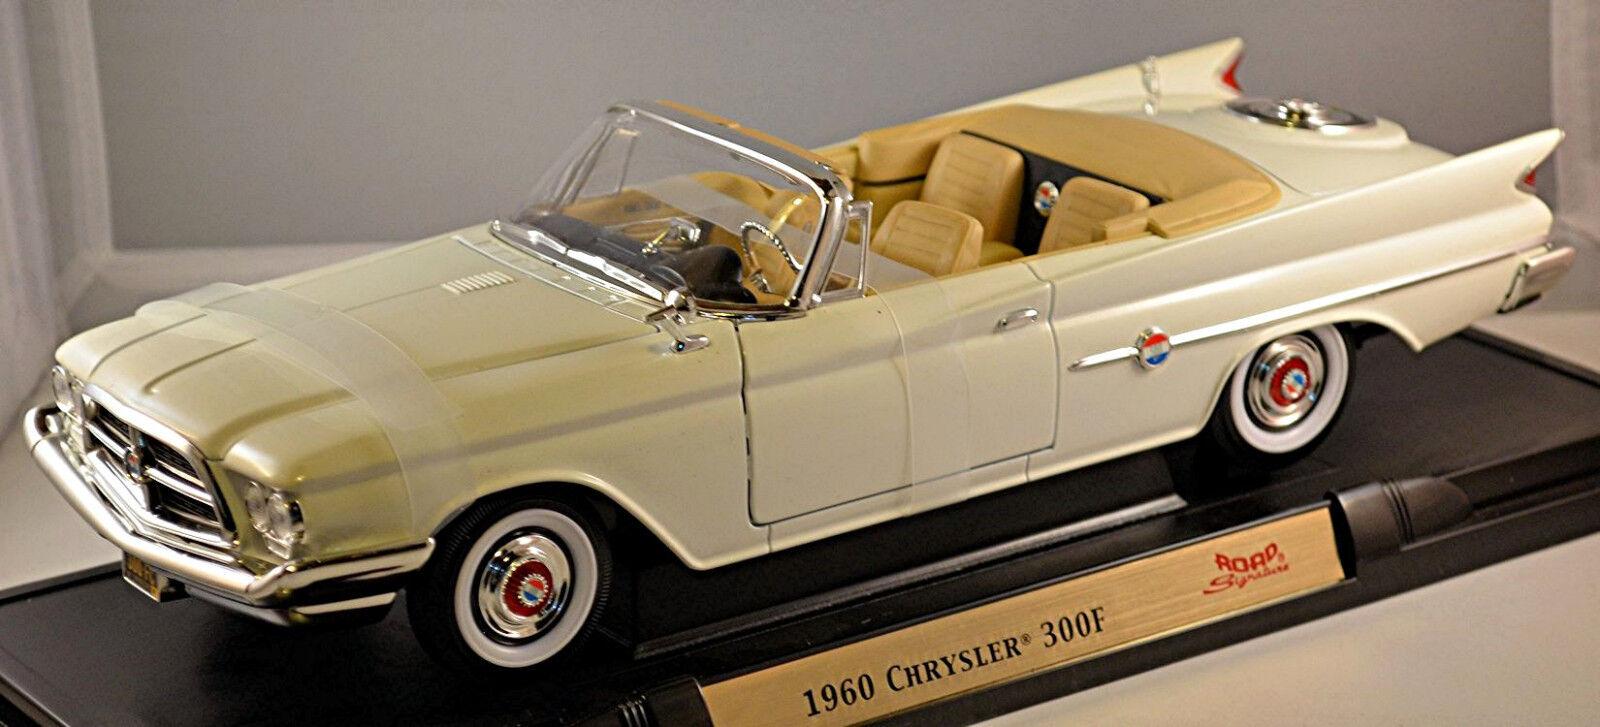 CHRYSLER 300 F CABRIOLET serie 1960 pc3-300 BIANCO bianca 1 18 Yat Ming